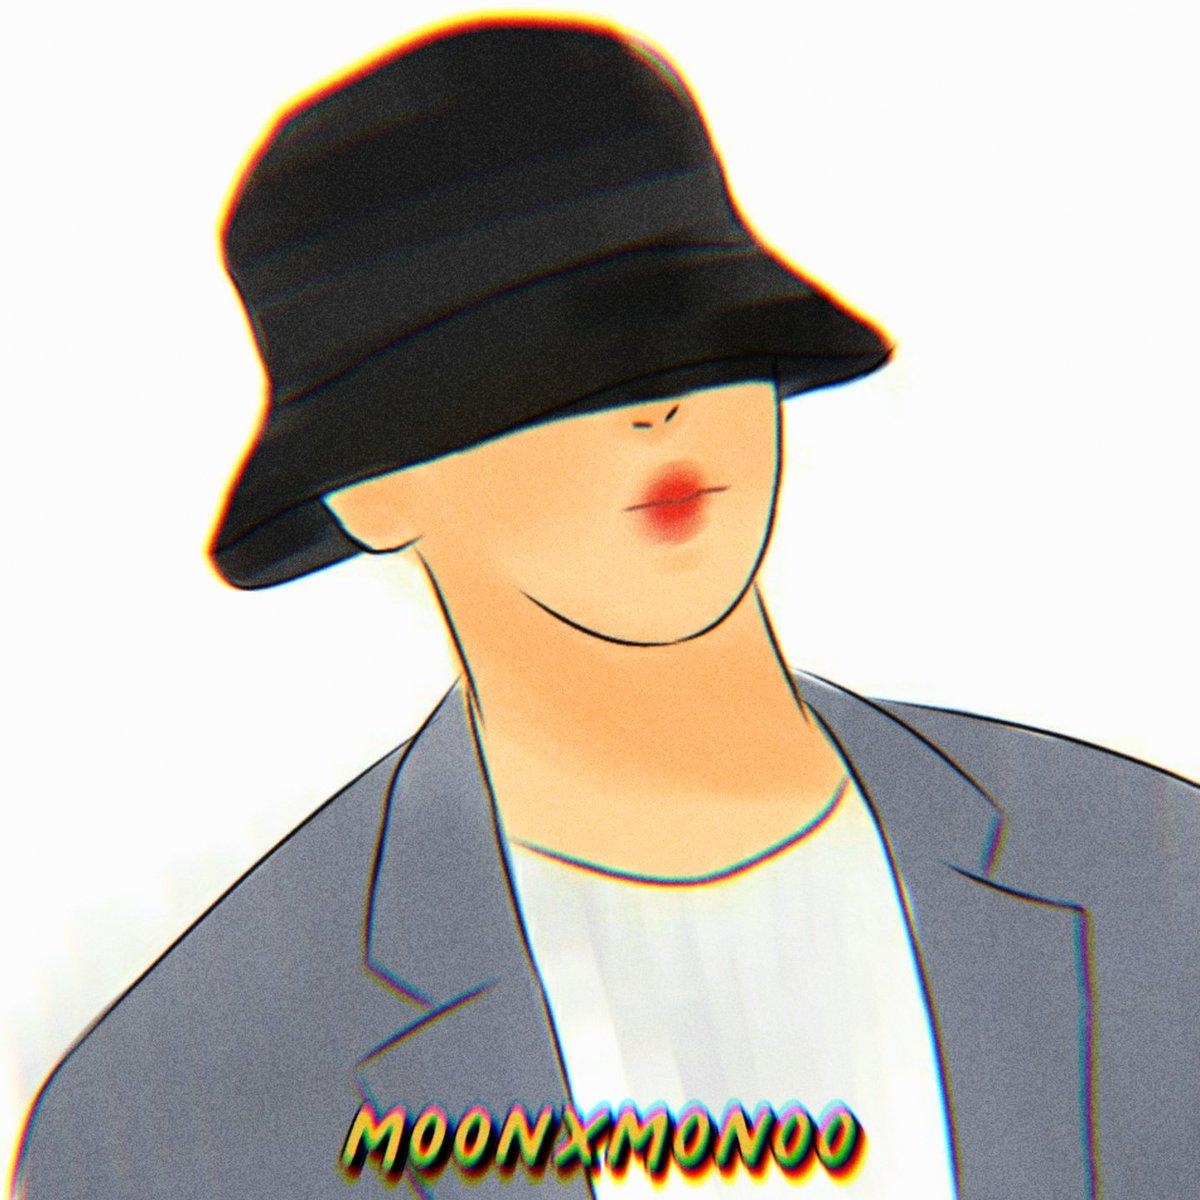 I forgot the hashtag 😭💔  #JIN #KIMSEOKJIN #jinbts #BTSJIN #SEOKJIN #seokjinnie #worldwidehandsome #moon #OurMoonJinDay #8YearsWithMoon #plumpy #JINJIN #FANART #fanartbts #btsart #moonxmonoo